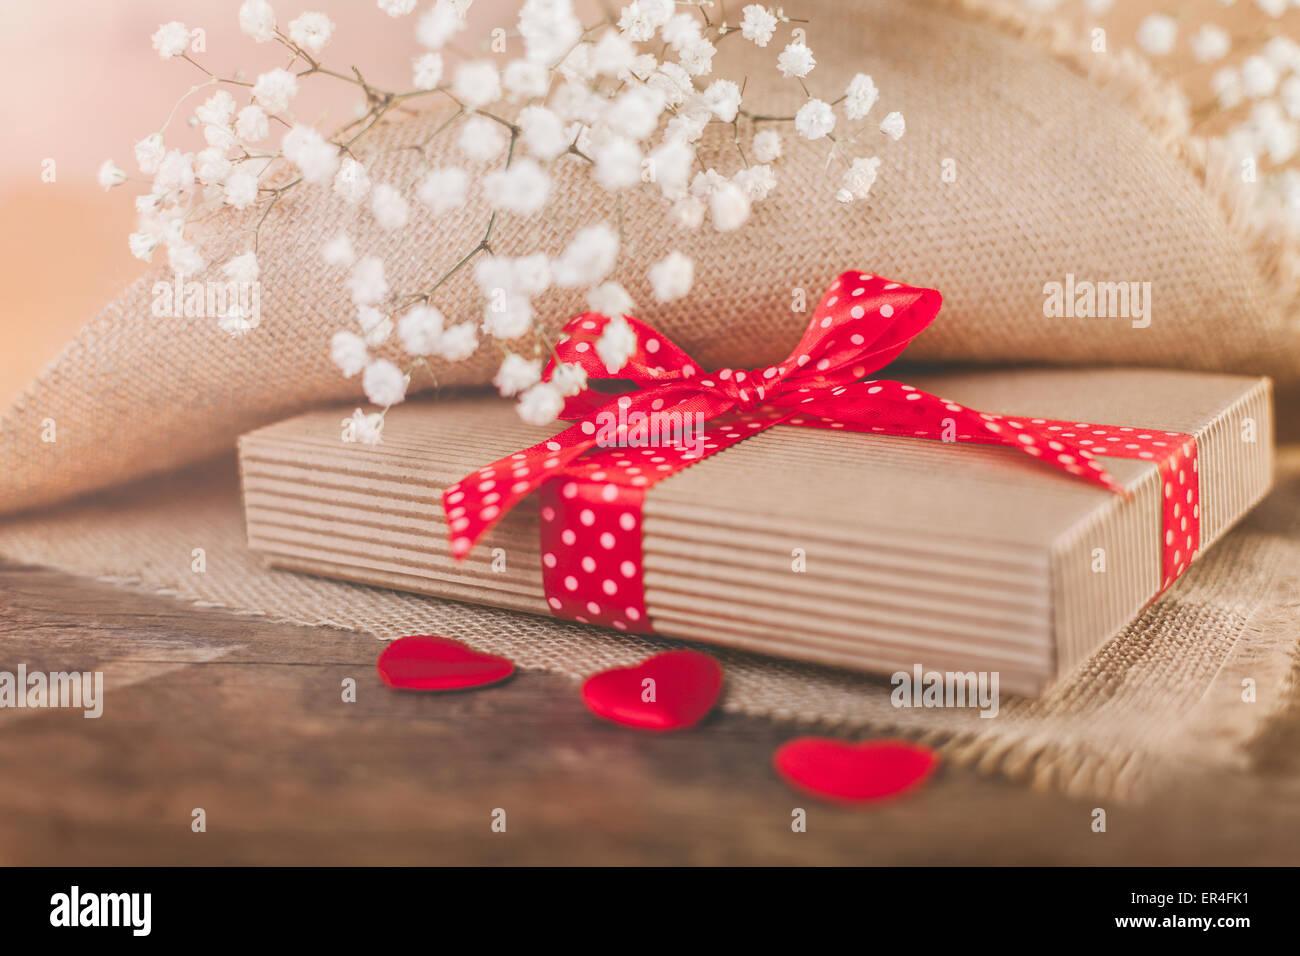 Valentines day present - Stock Image